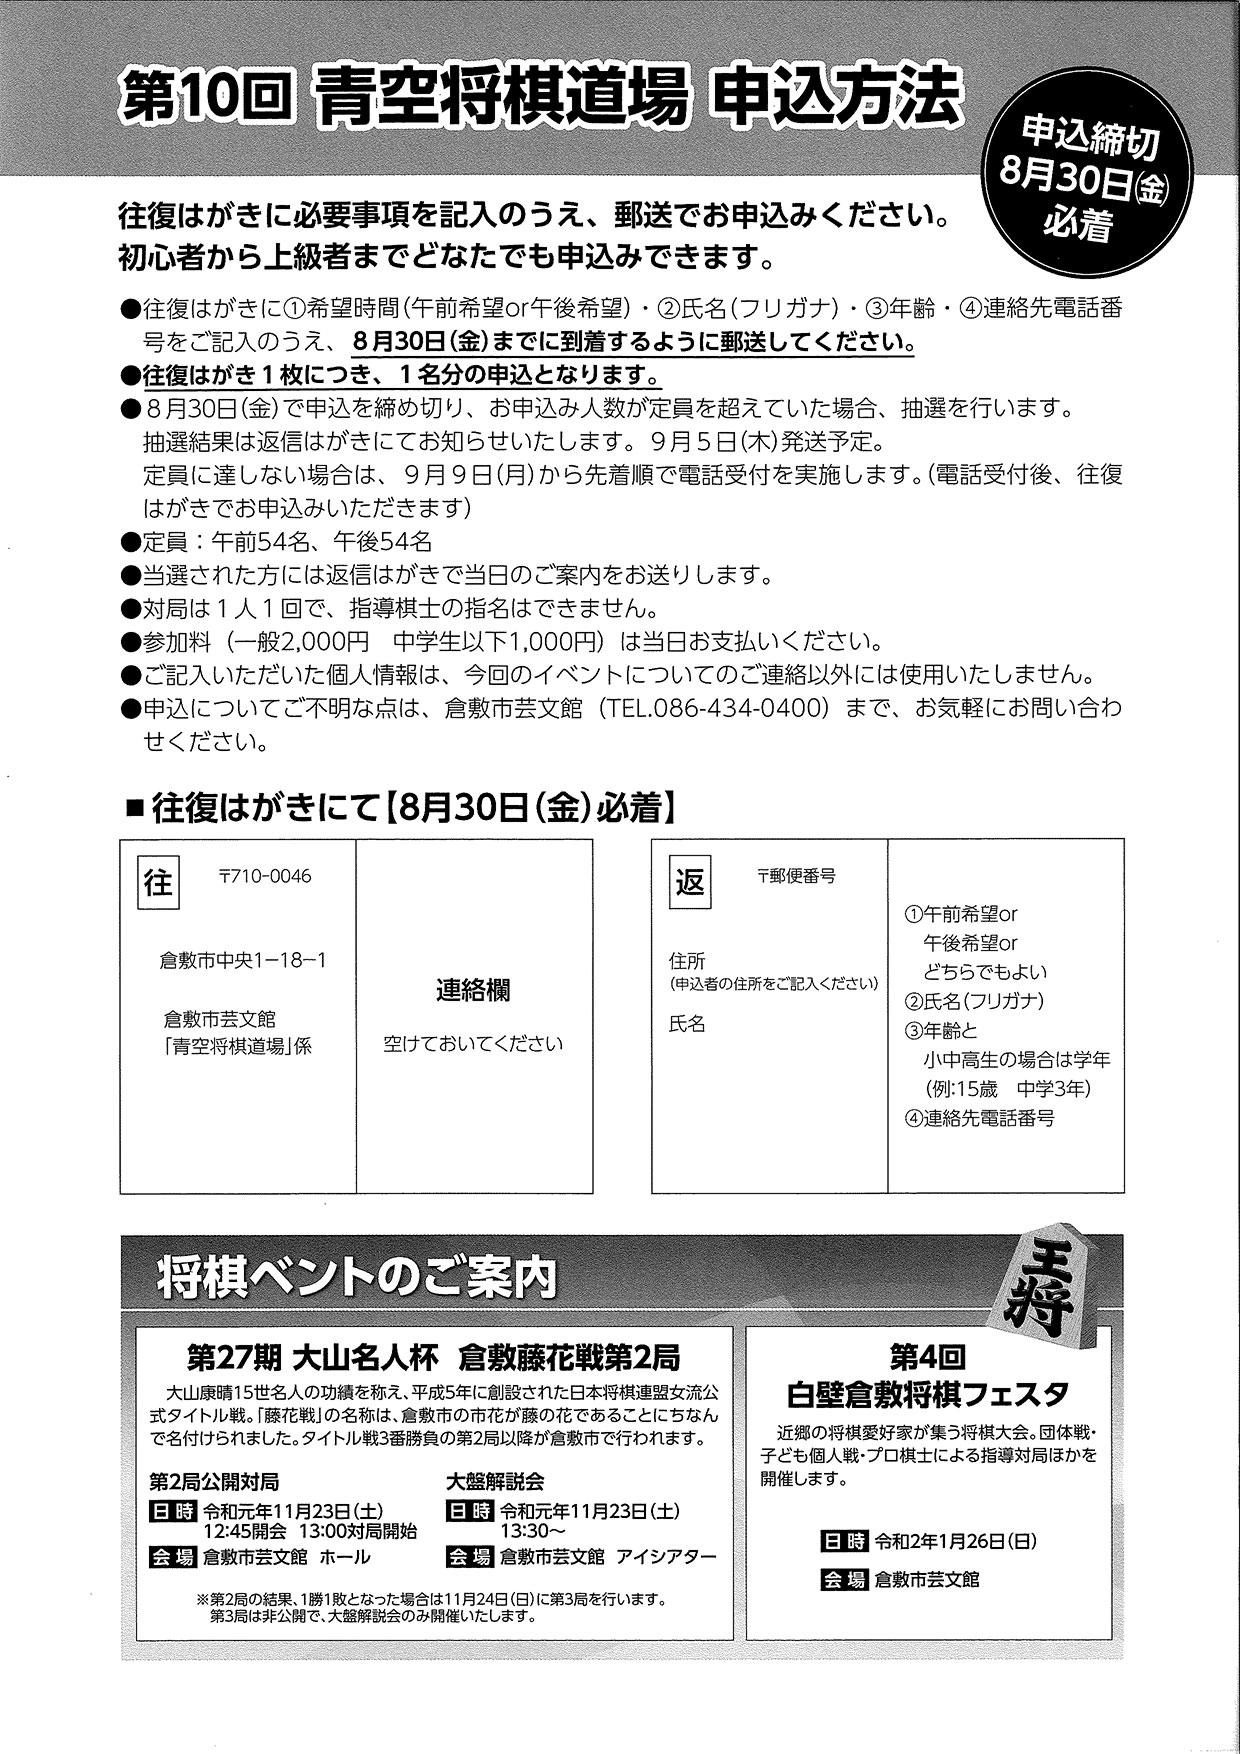 https://www.shogi.or.jp/event/20191006kurasiki-2.jpg